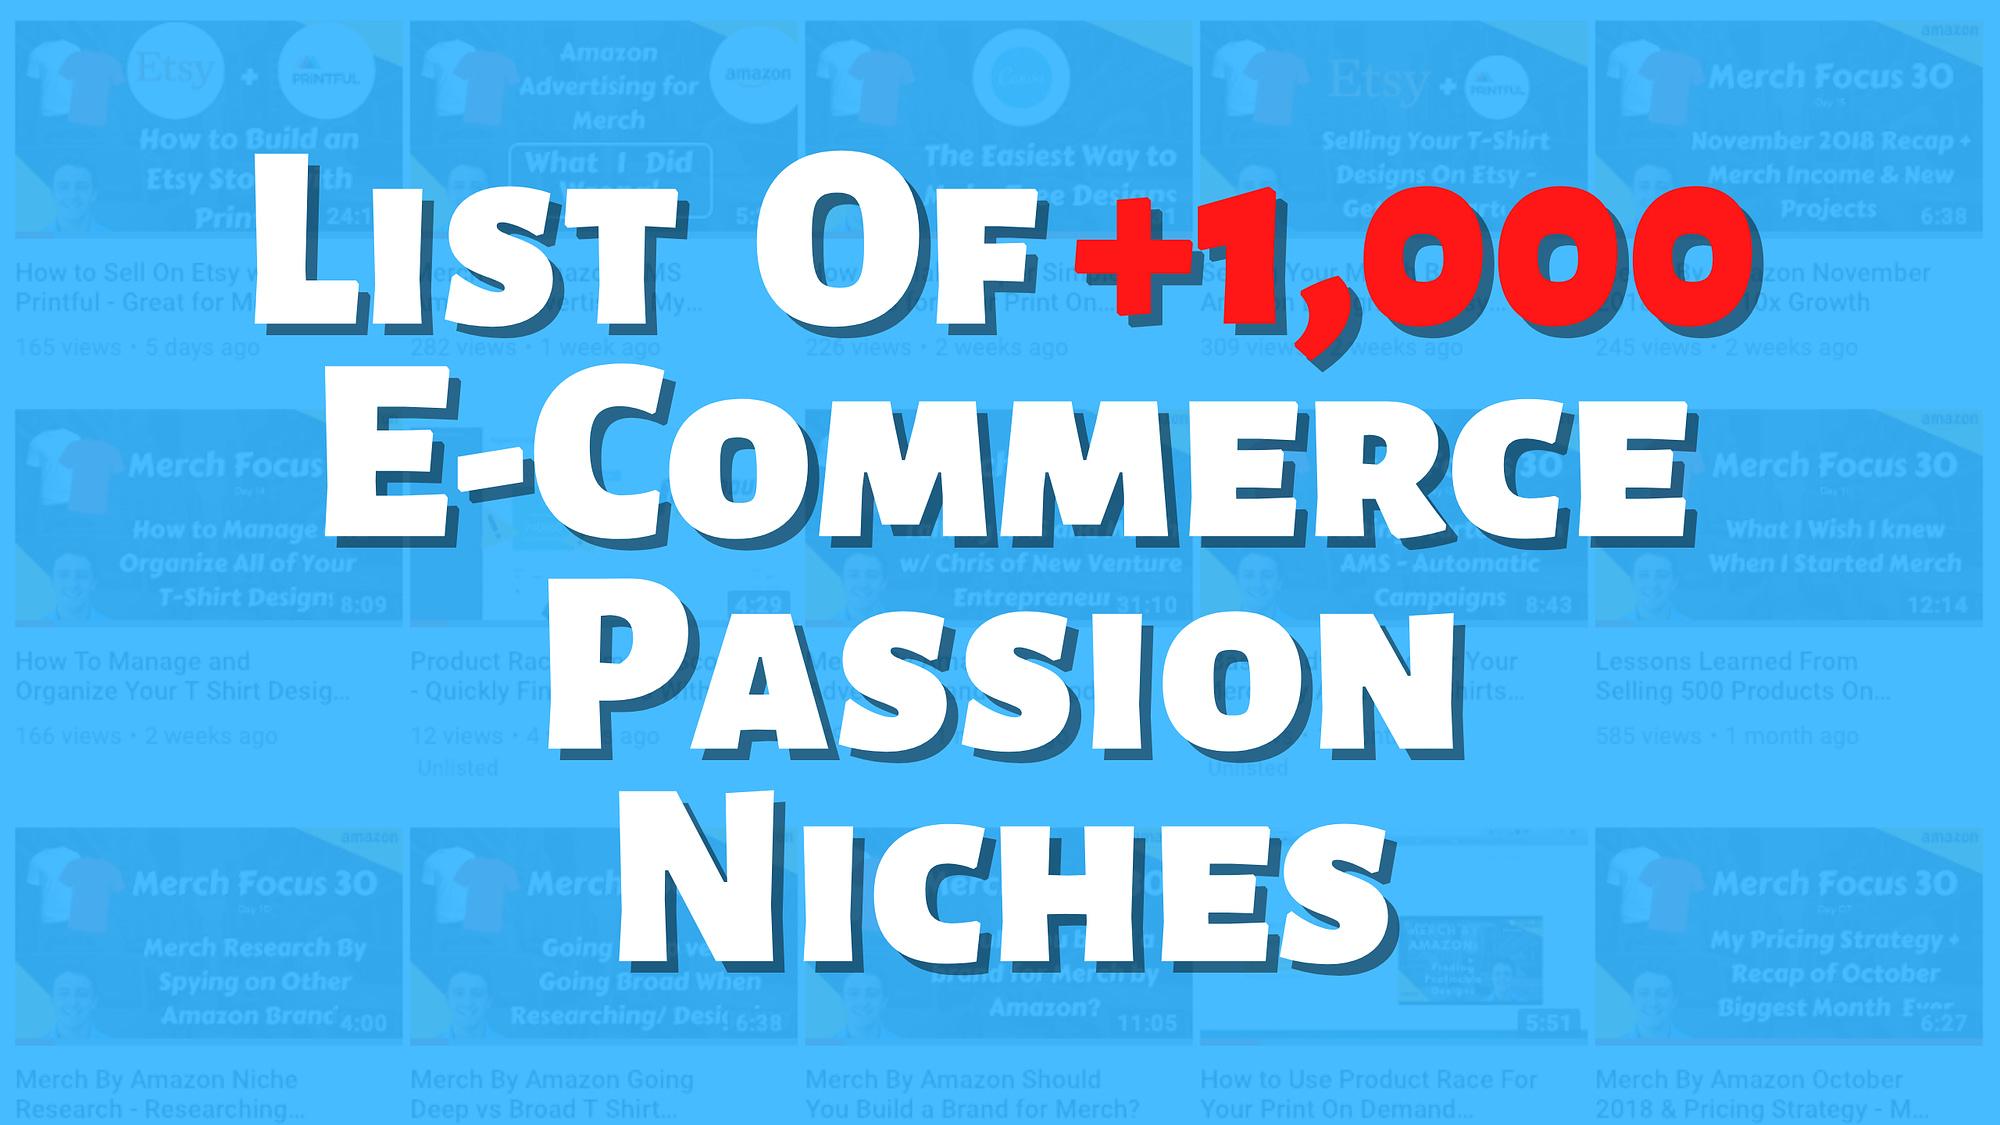 List of E-Commerce Passion Niches